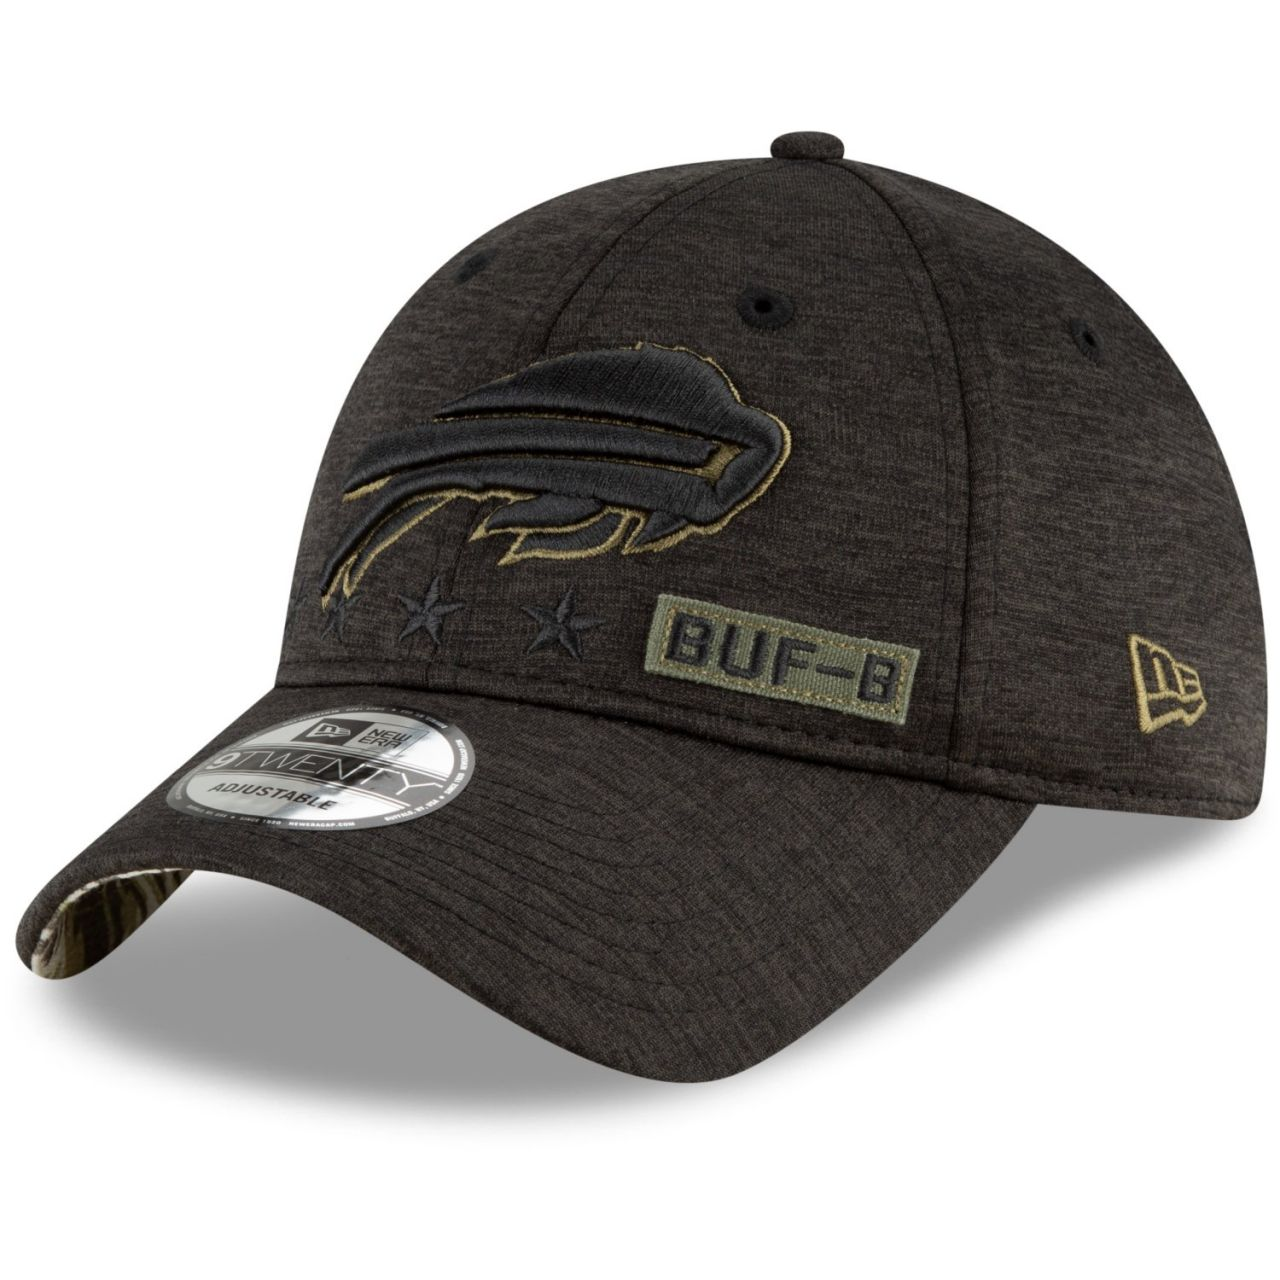 amfoo - New Era 9TWENTY Cap Salute to Service Buffalo Bills